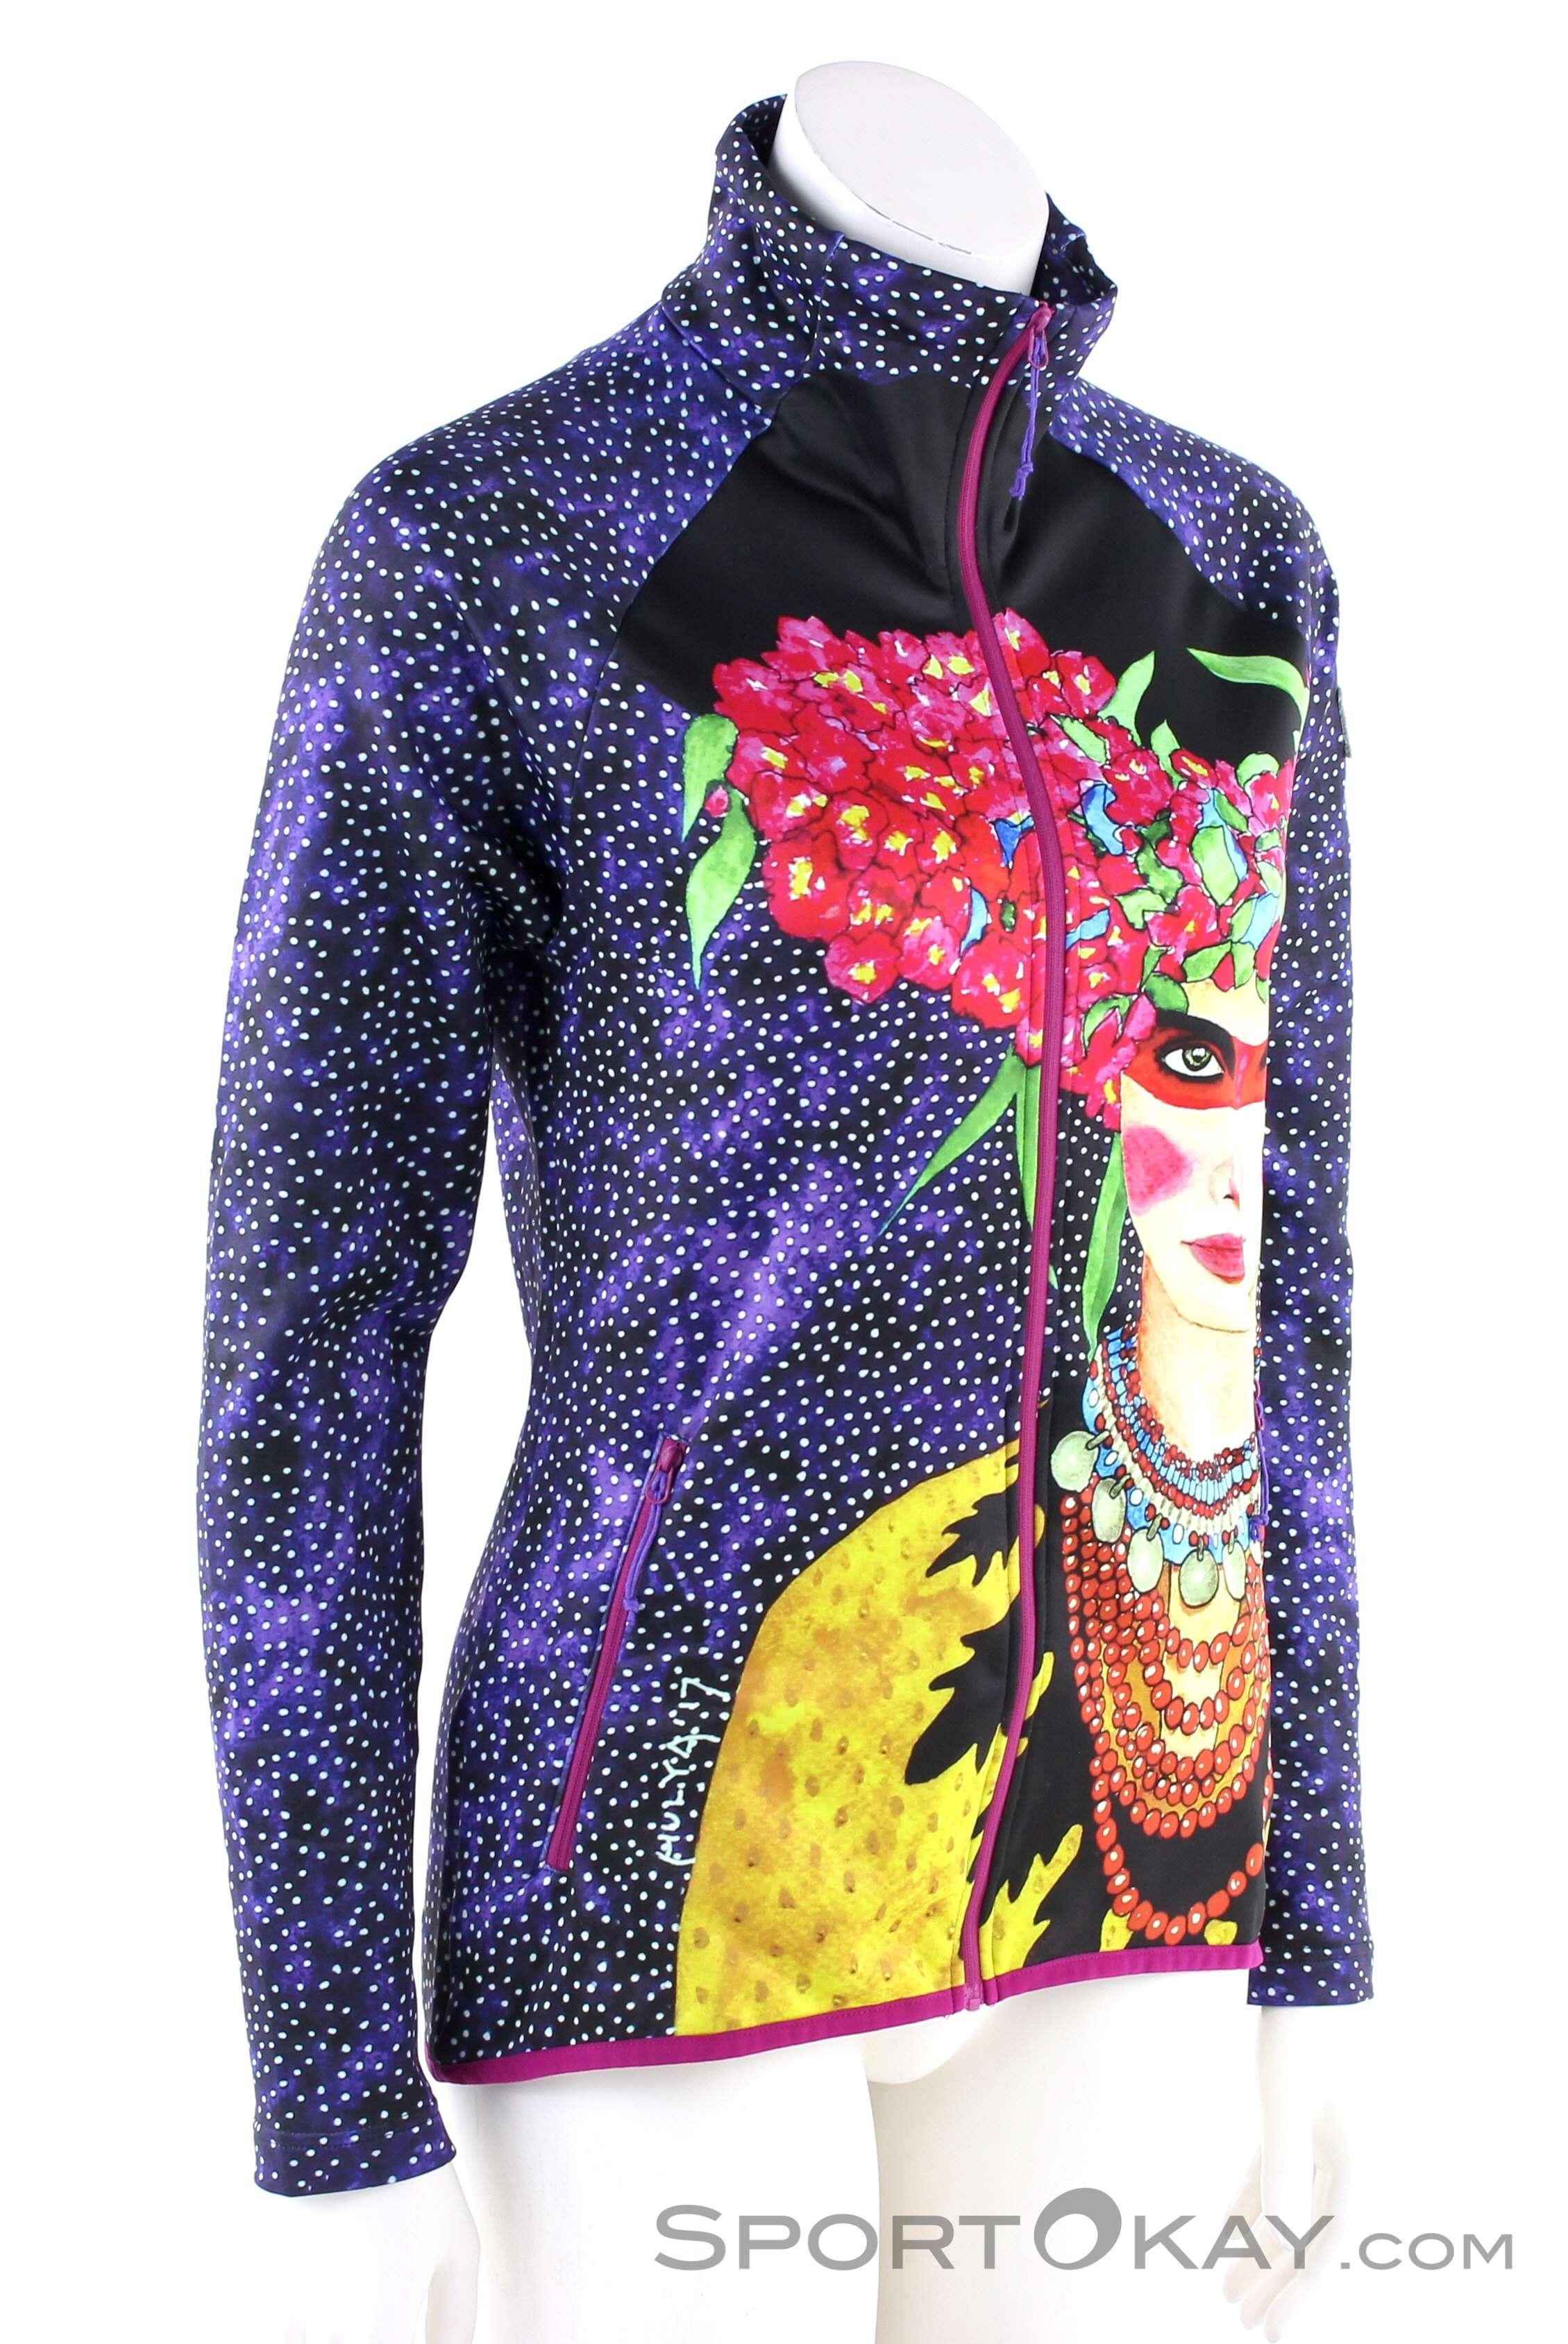 Crazy Idea Crazy Idea Tricot Damen Tourensweater